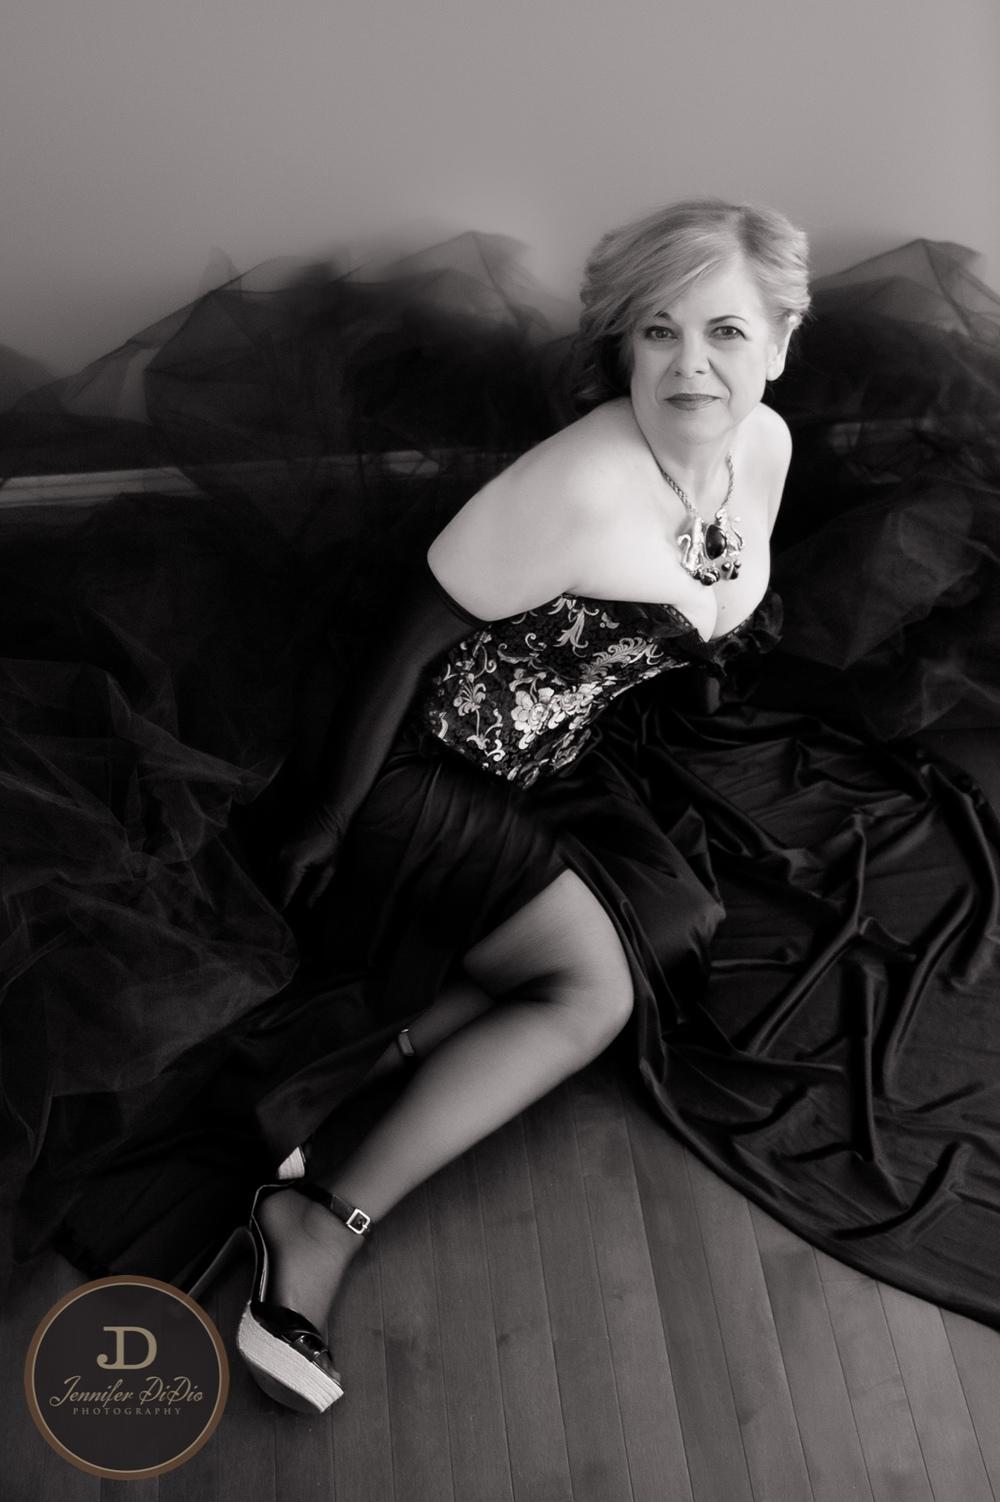 Jennifer.DiDio.Photography.Wroe.Judi.2014-207.jpg